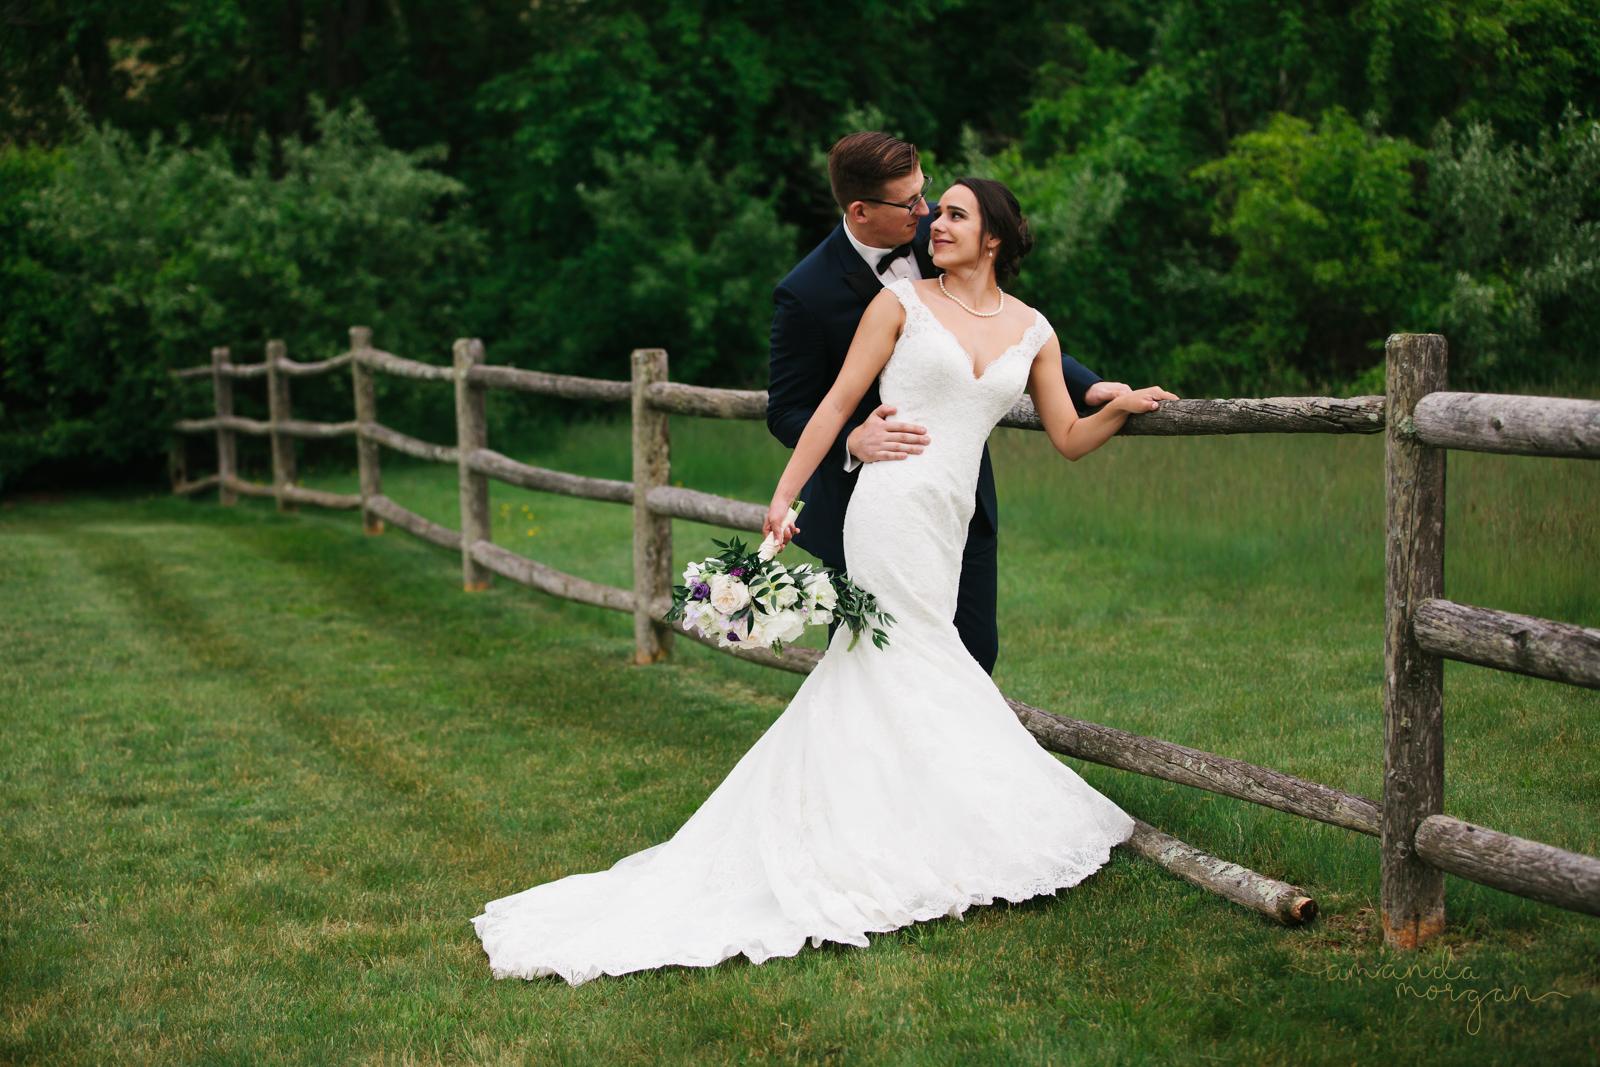 Publick-House-Wedding-Amanda-Morgan-43.jpg